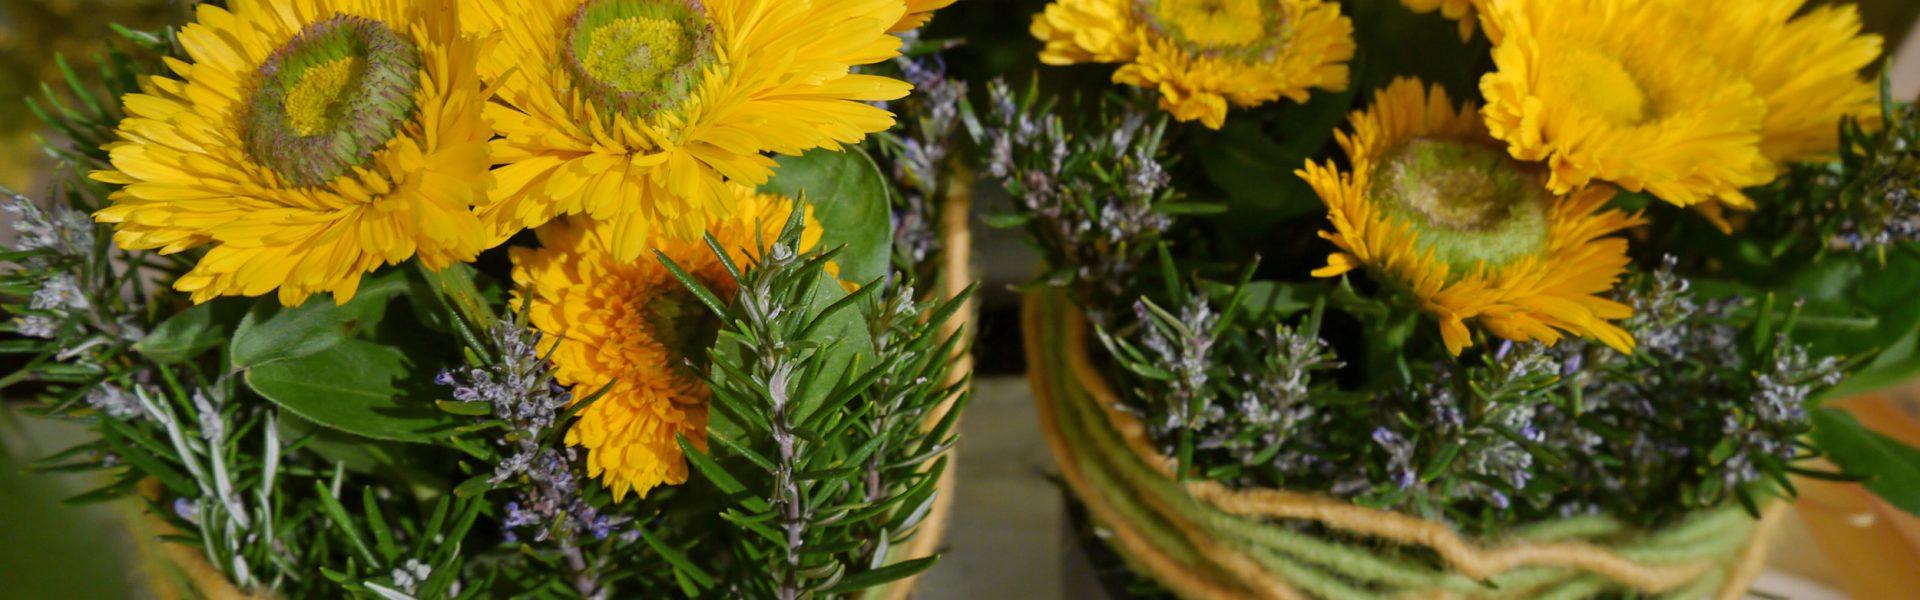 Blomster bringer glede, ikke smitte!